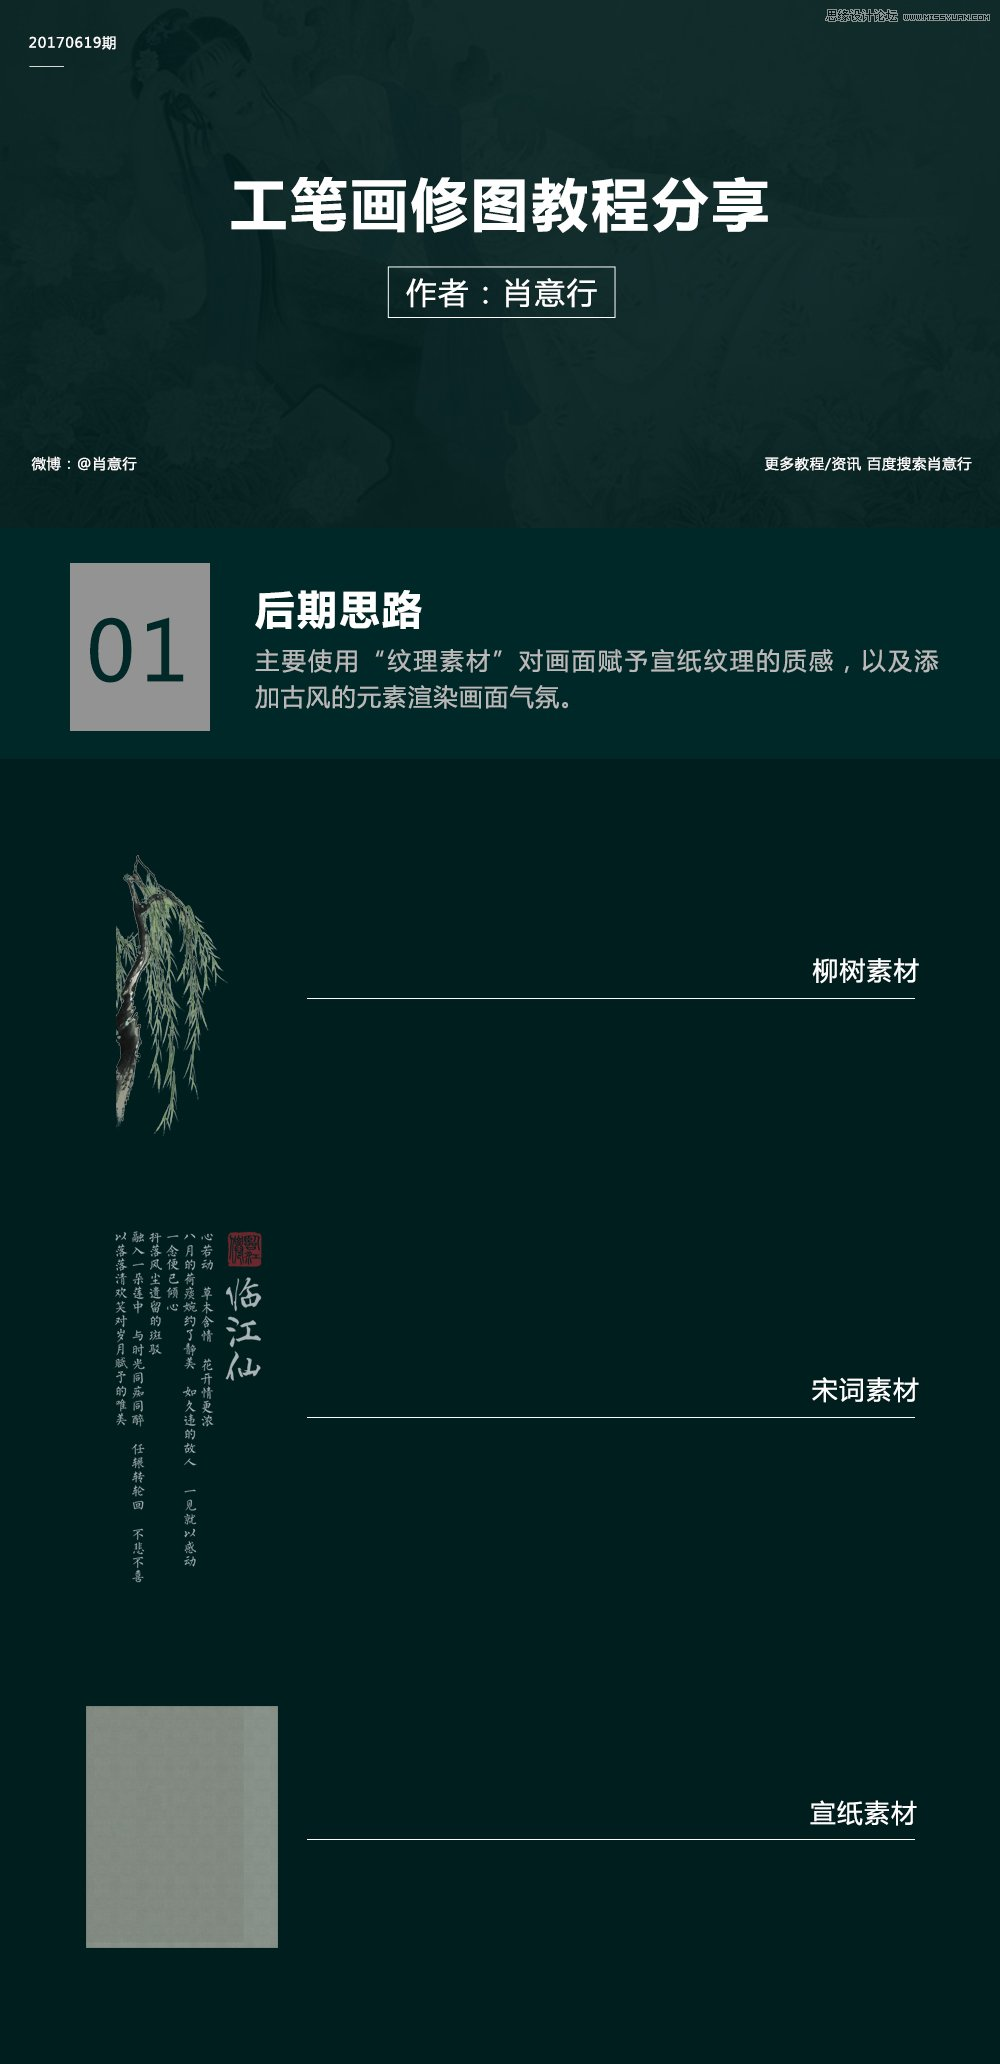 Photoshop制作中国风古典主题工笔画人像结果教程